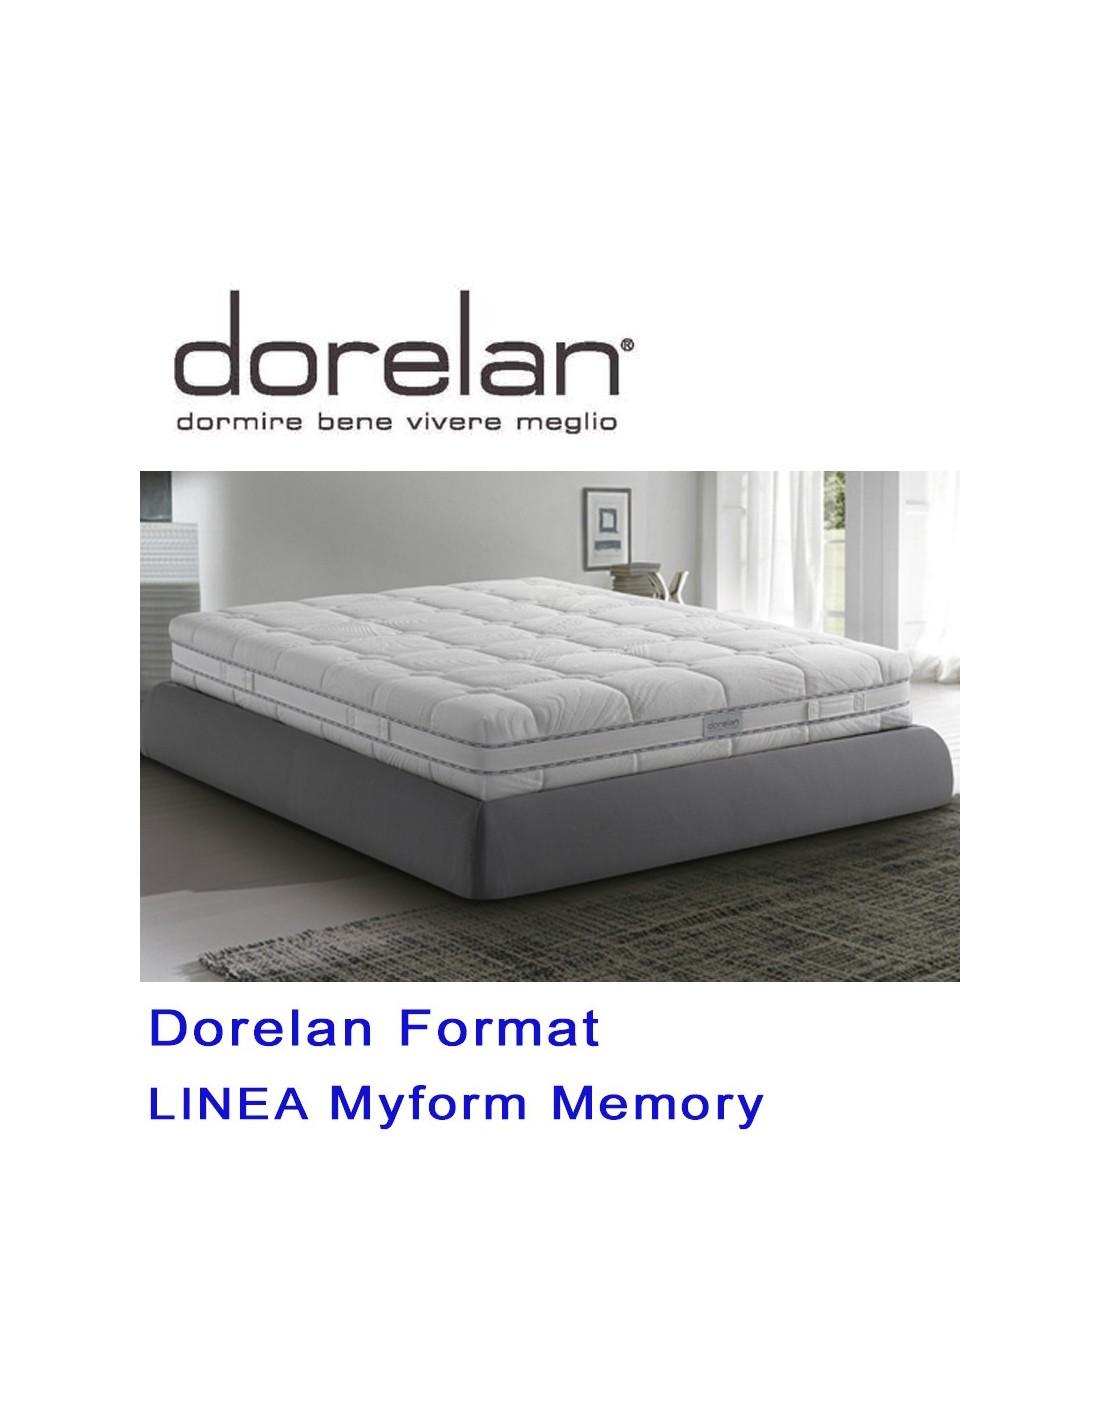 Dorelan Format Myform Memory